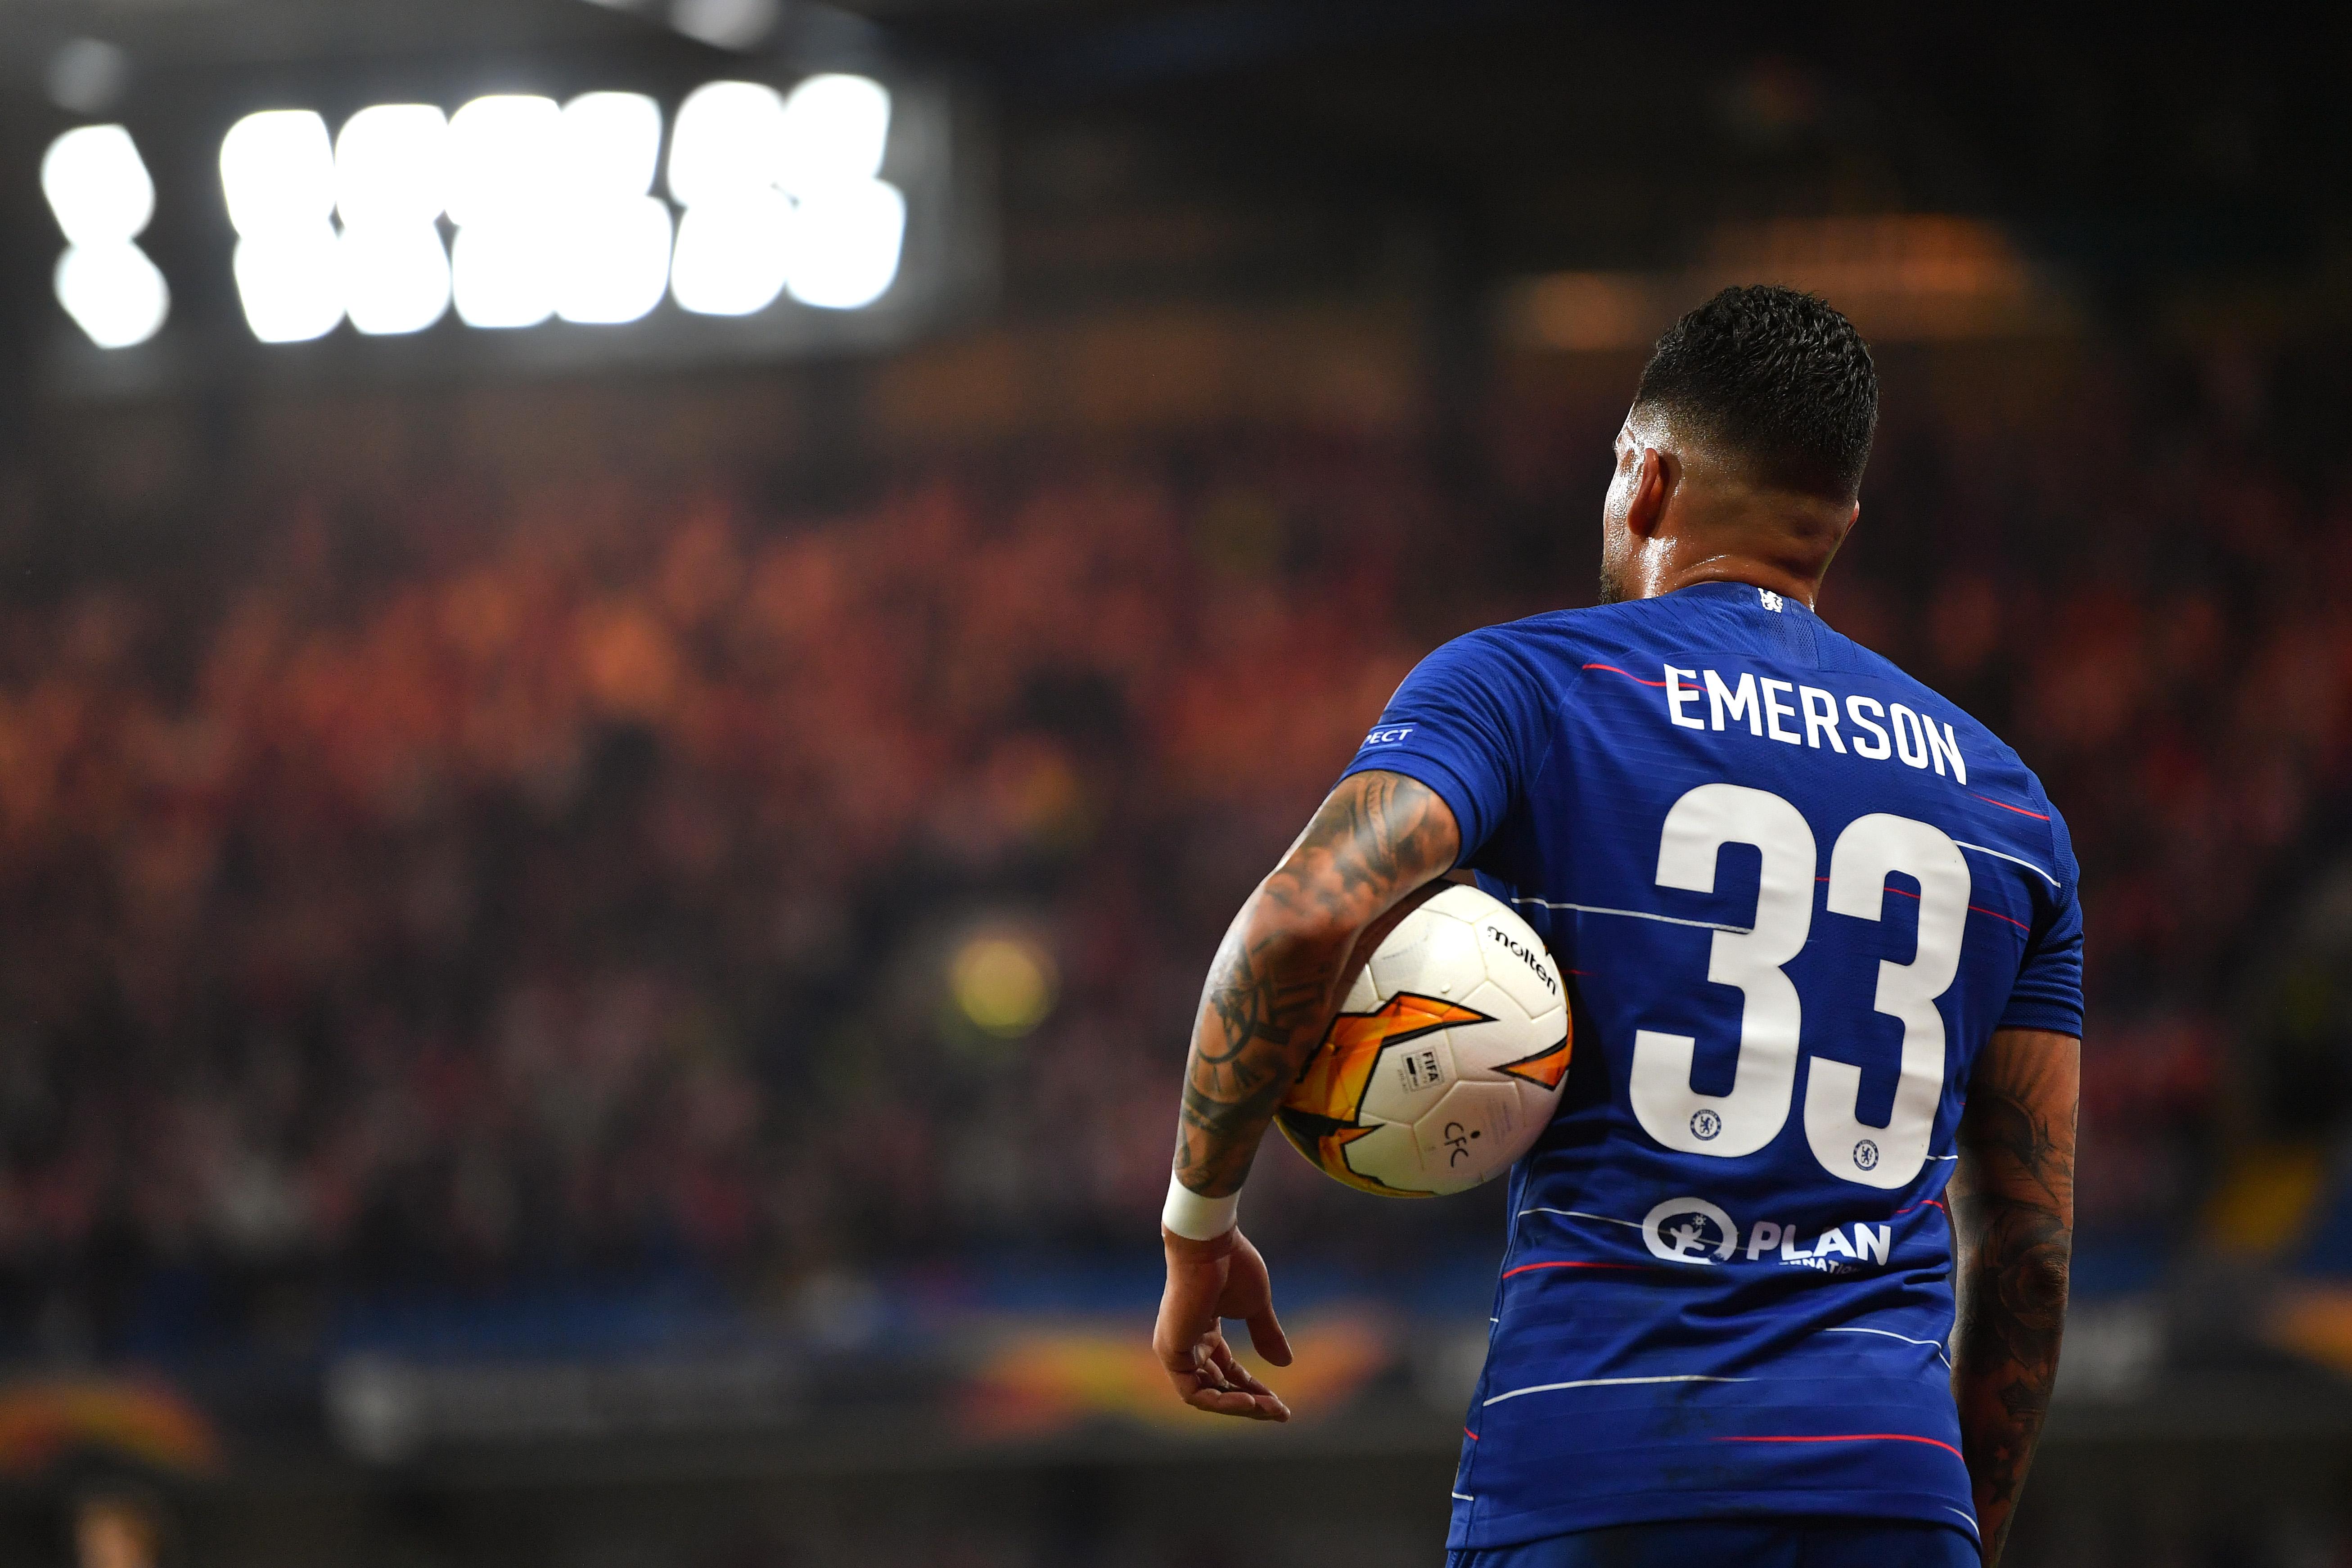 Juventus want Emerson to follow Sarri — report